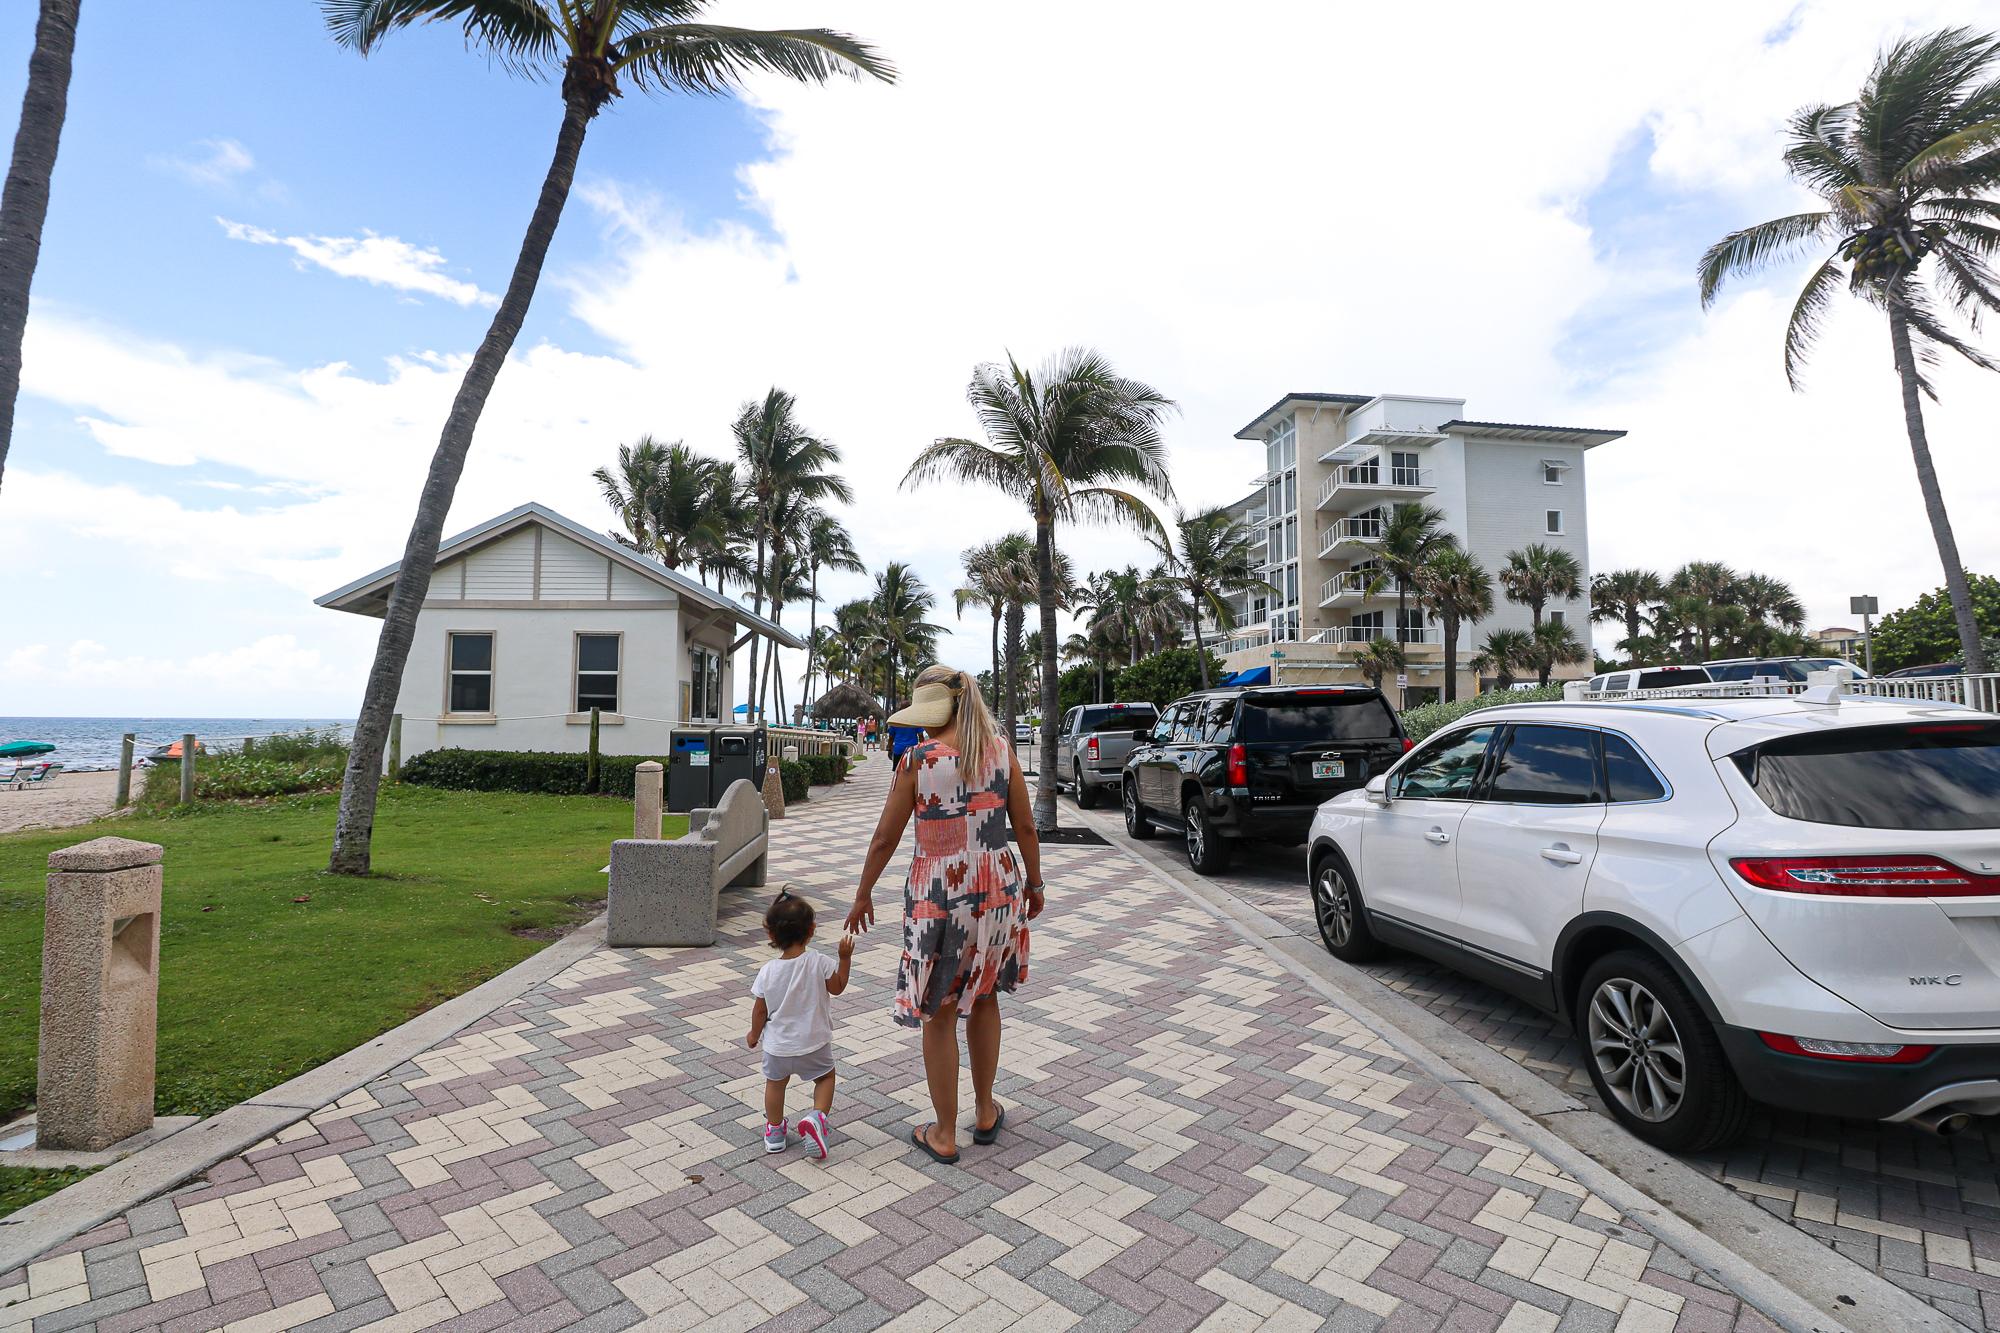 Atlantique Beach House Hotel - Single #1 photo 20179766